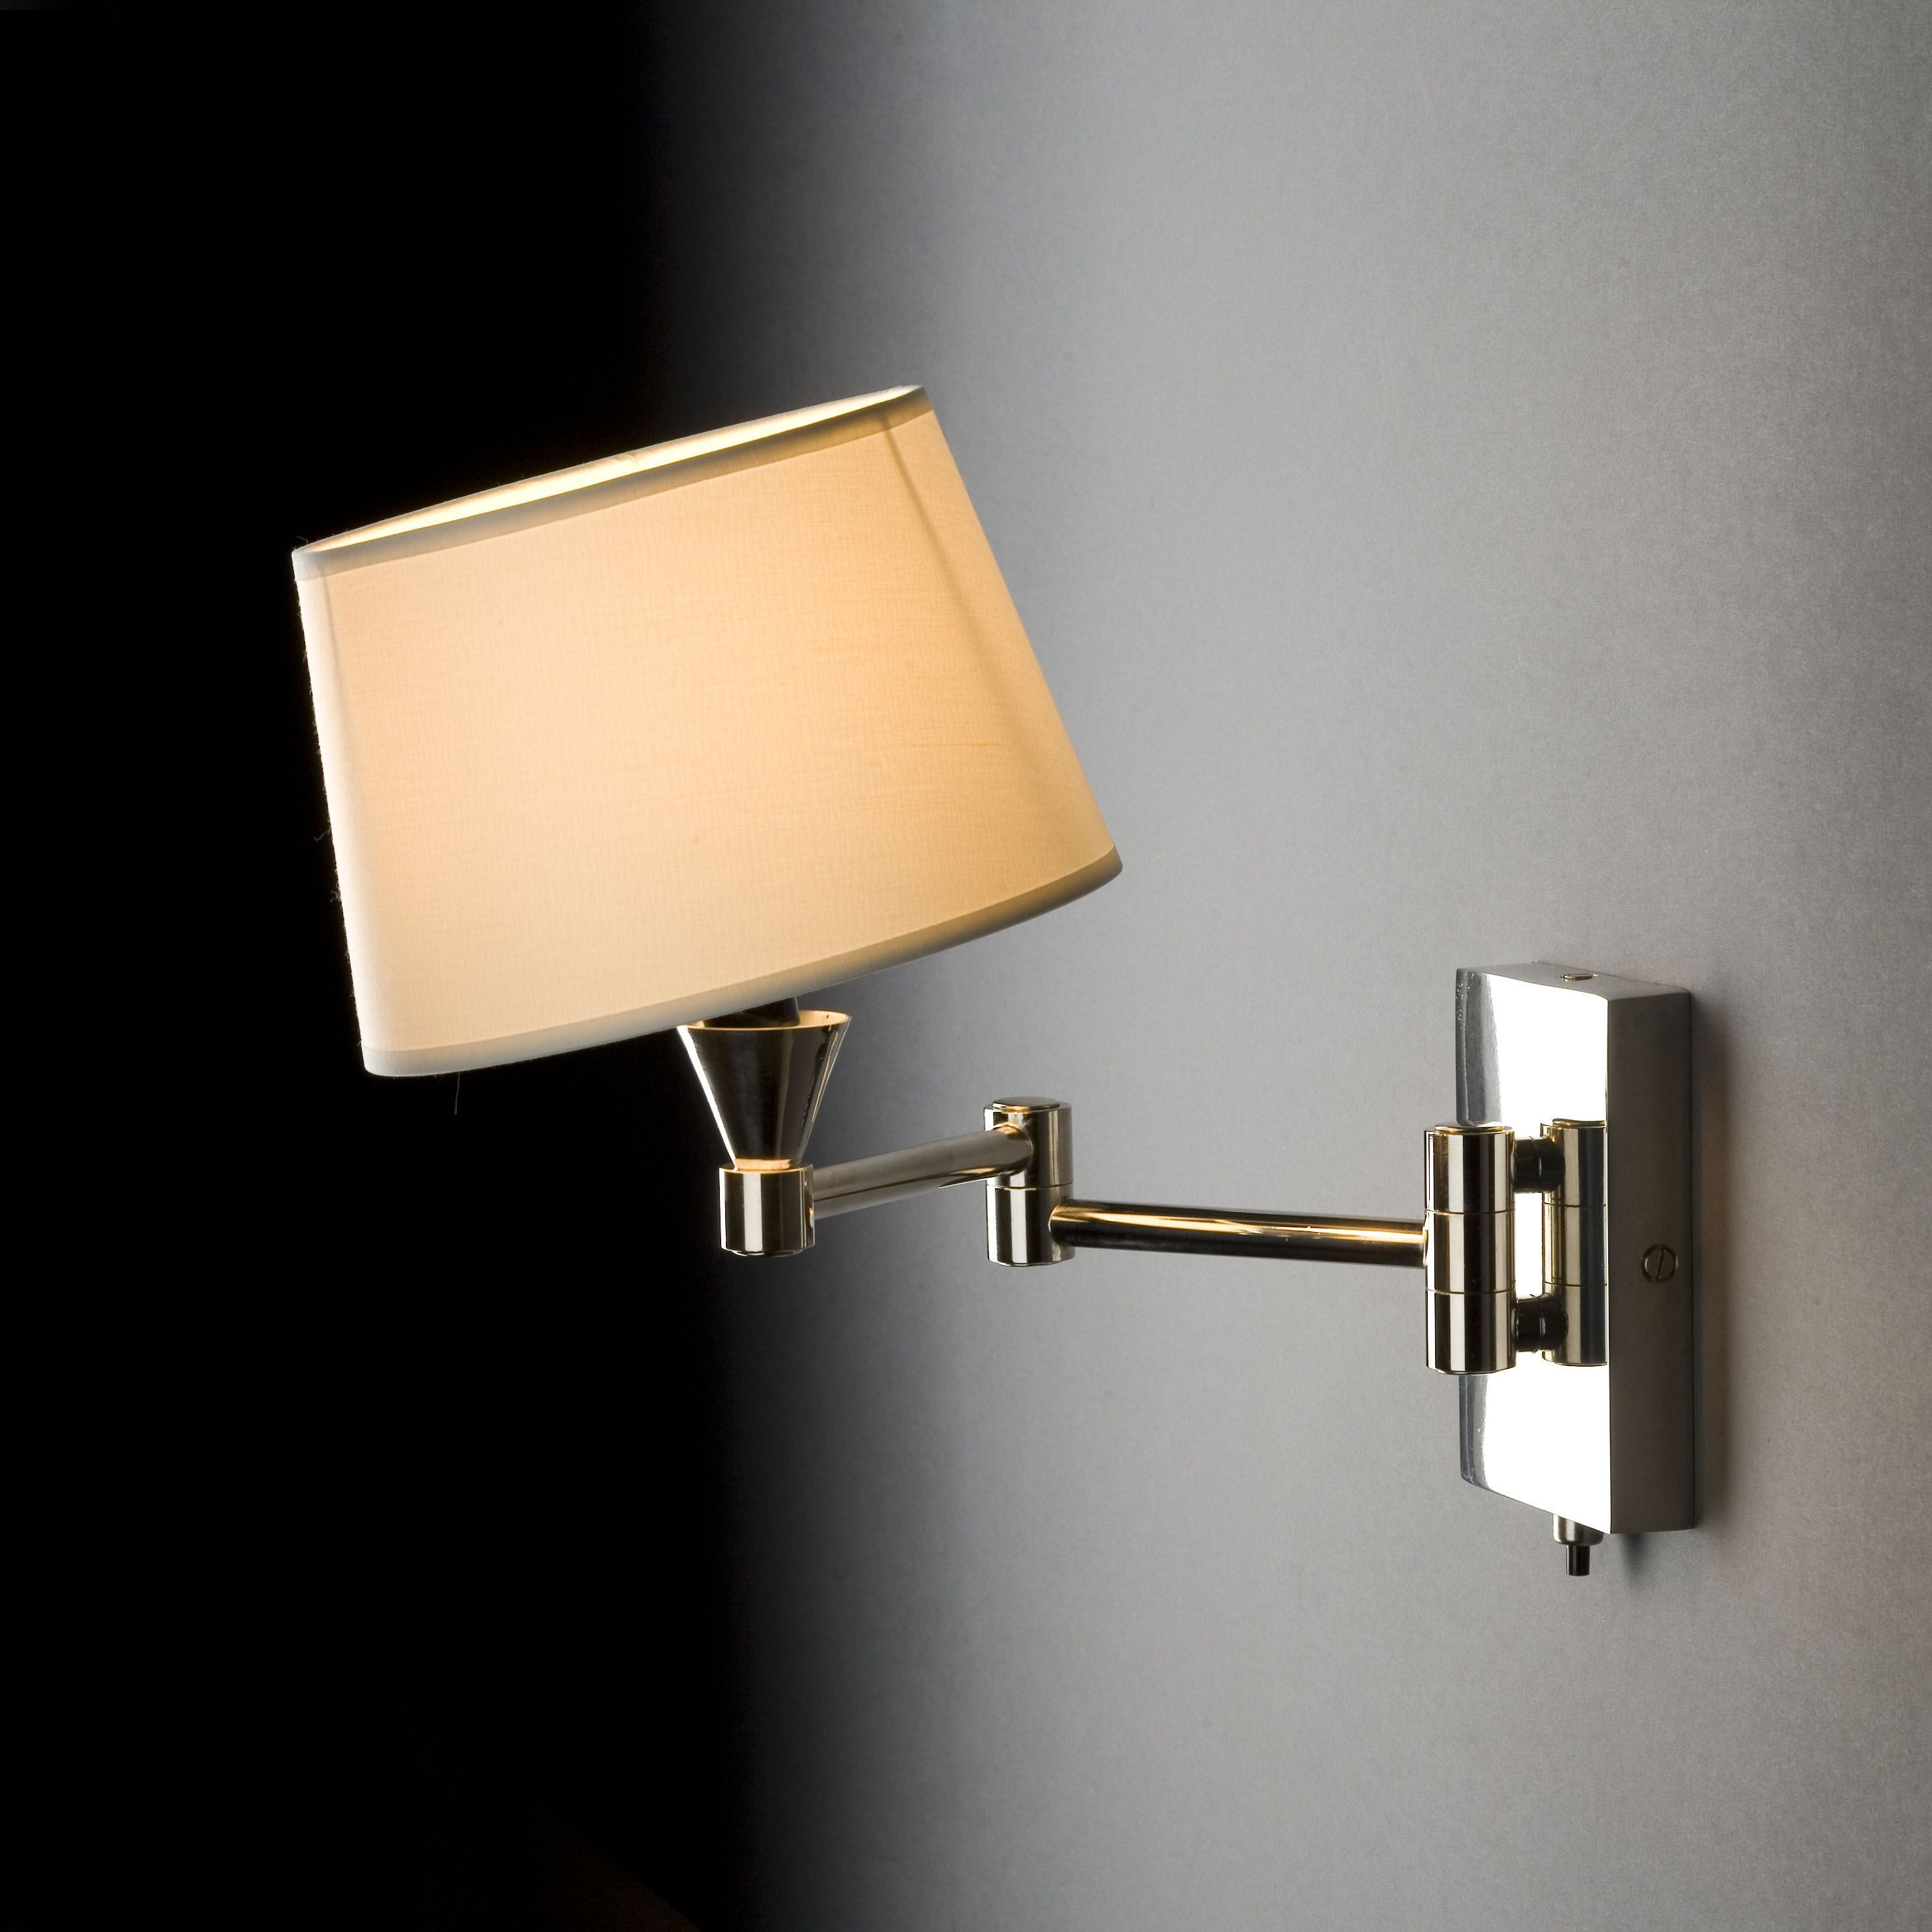 schwenkbare wandleuchte s nickel bei. Black Bedroom Furniture Sets. Home Design Ideas